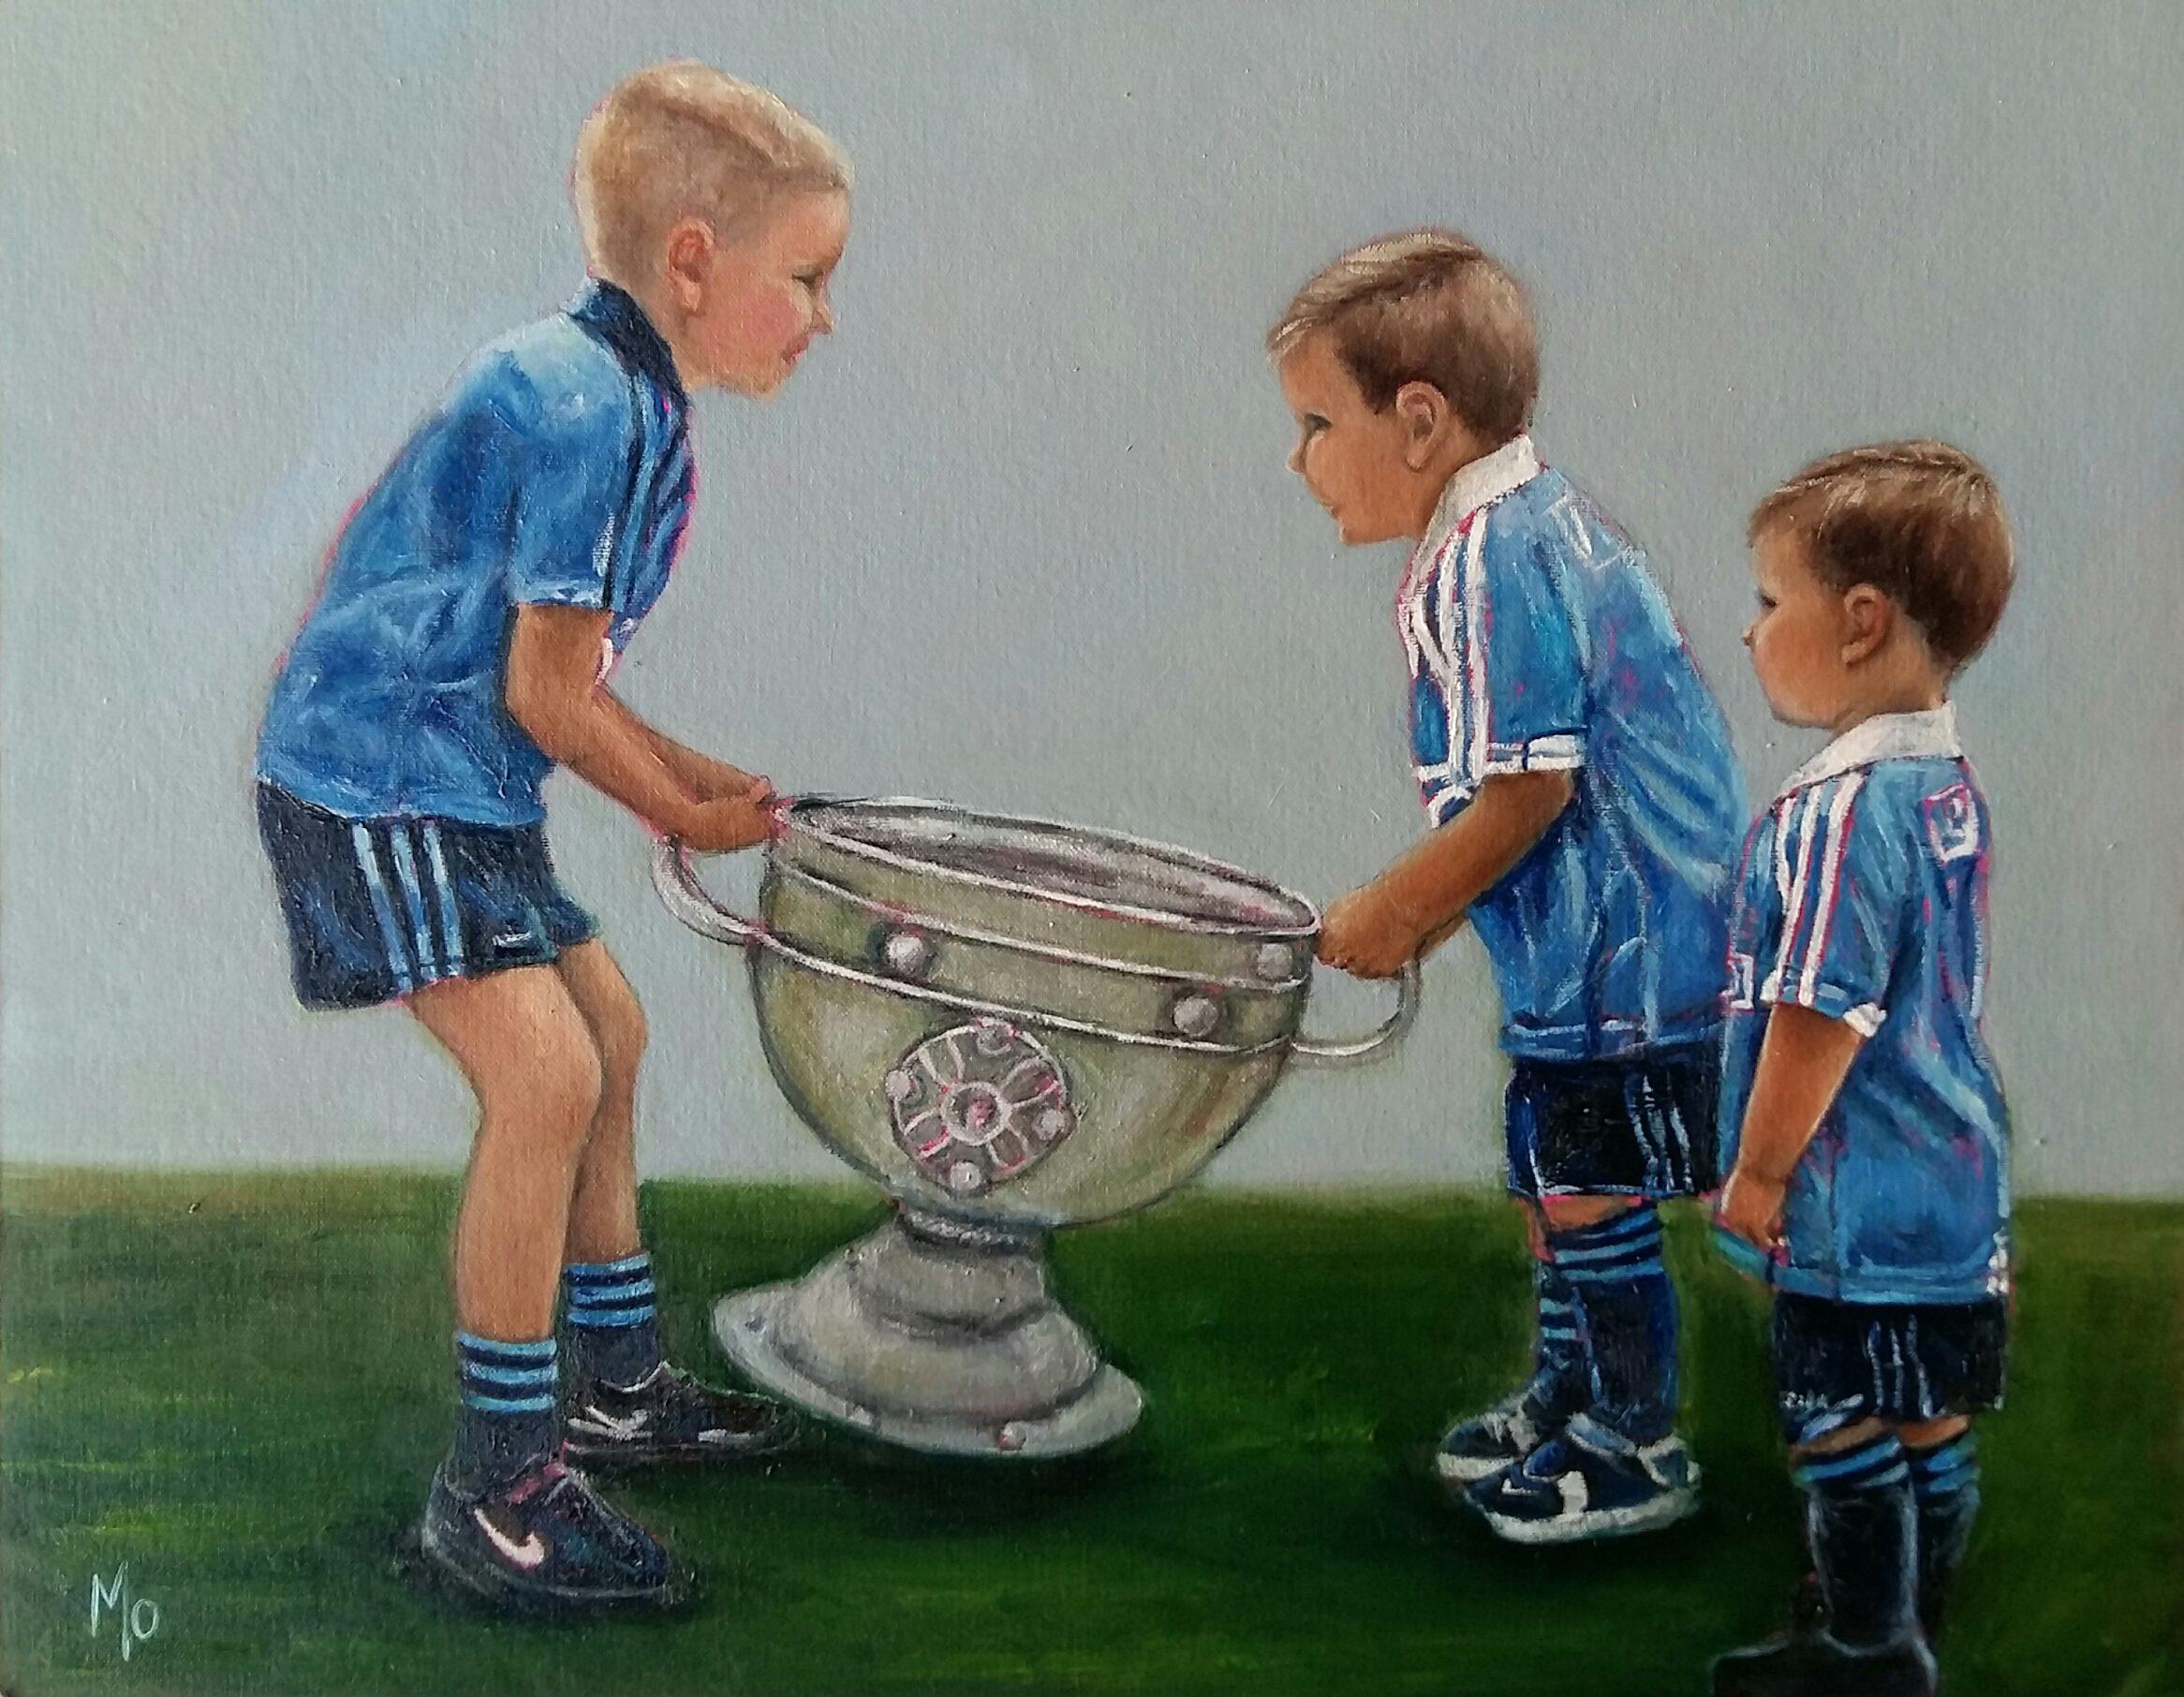 Three boys in Dublin Jerseys lifting the Sam Maguire